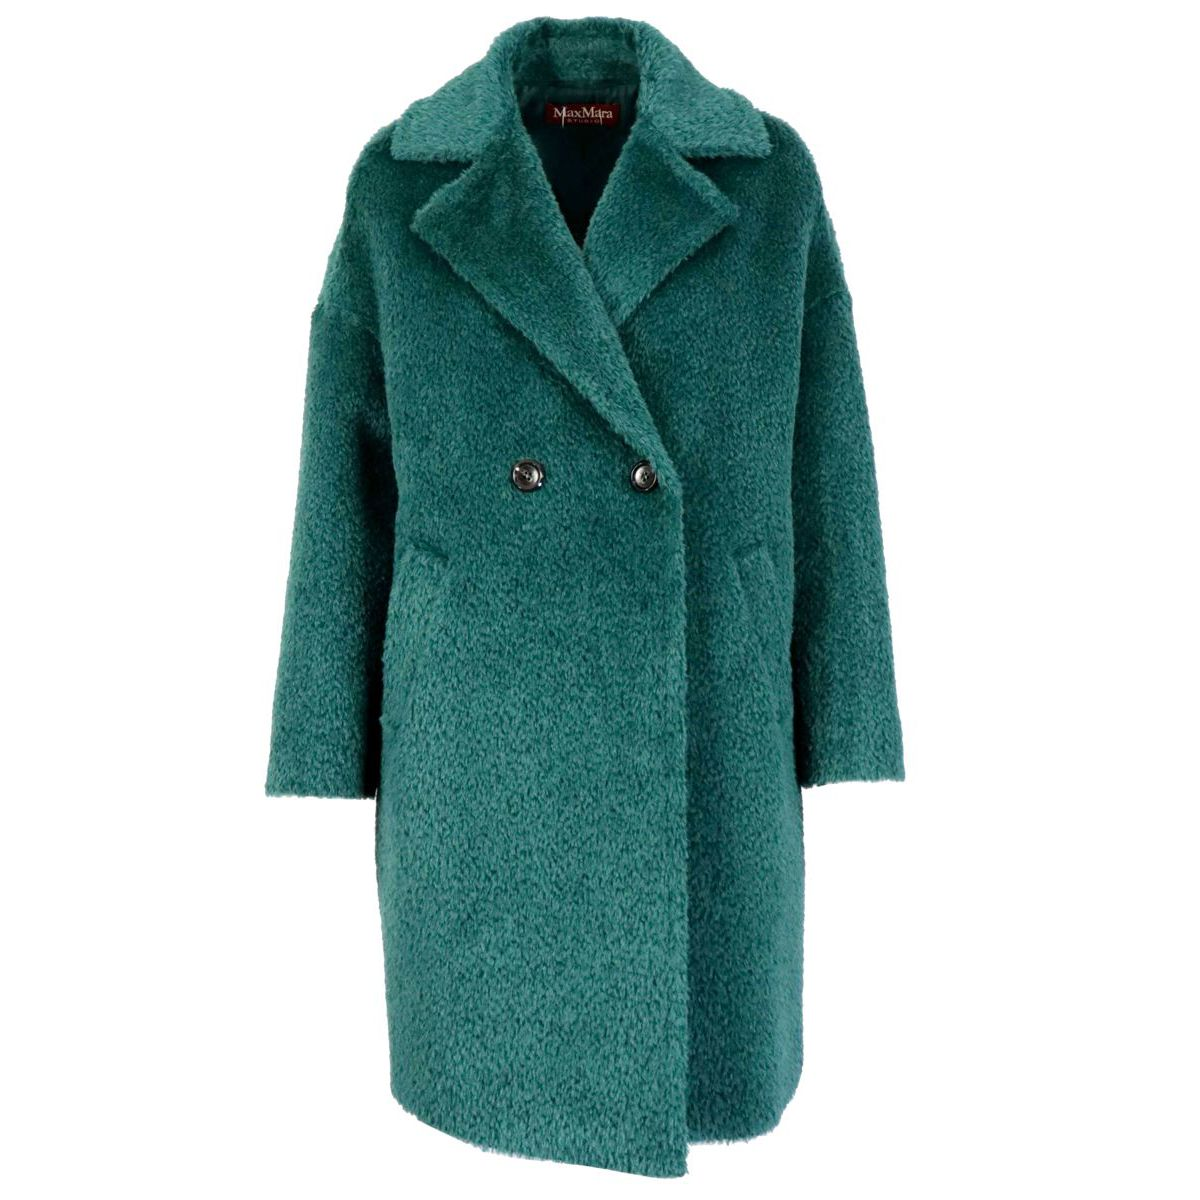 Jums double-breasted coat in alpaca and wool Pine green MAX MARA STUDIO